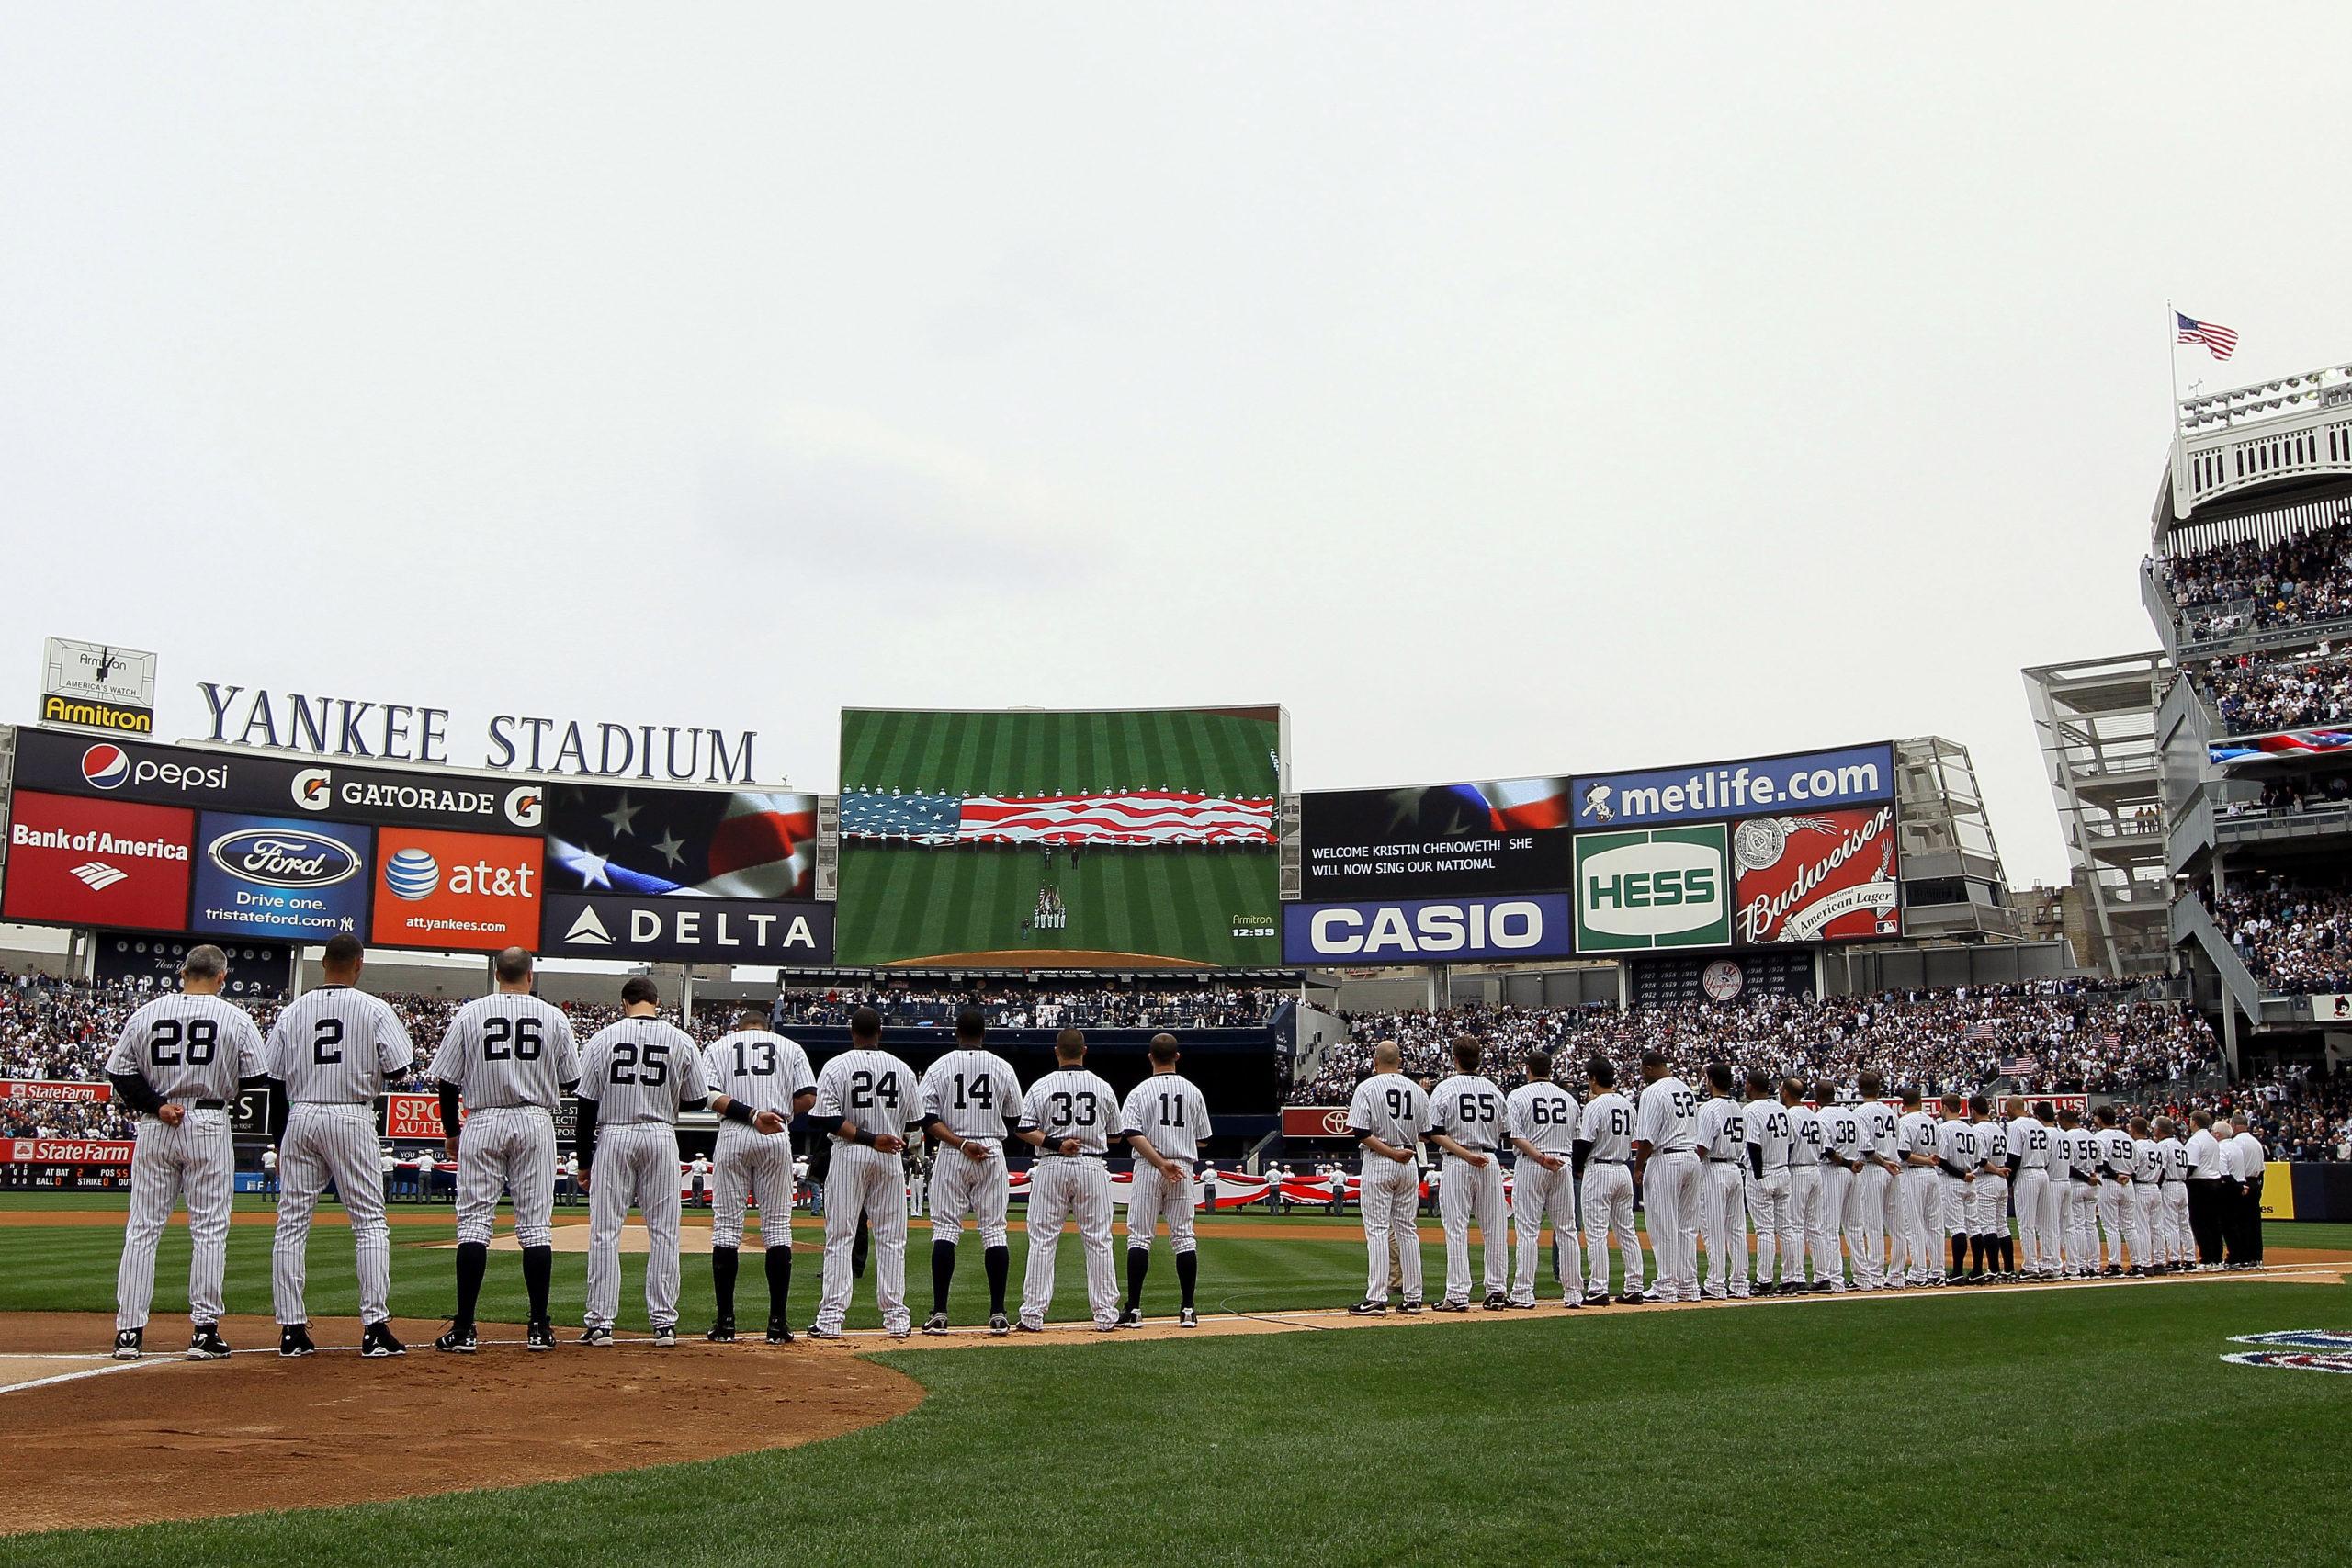 2010 New York Yankees' Statistics